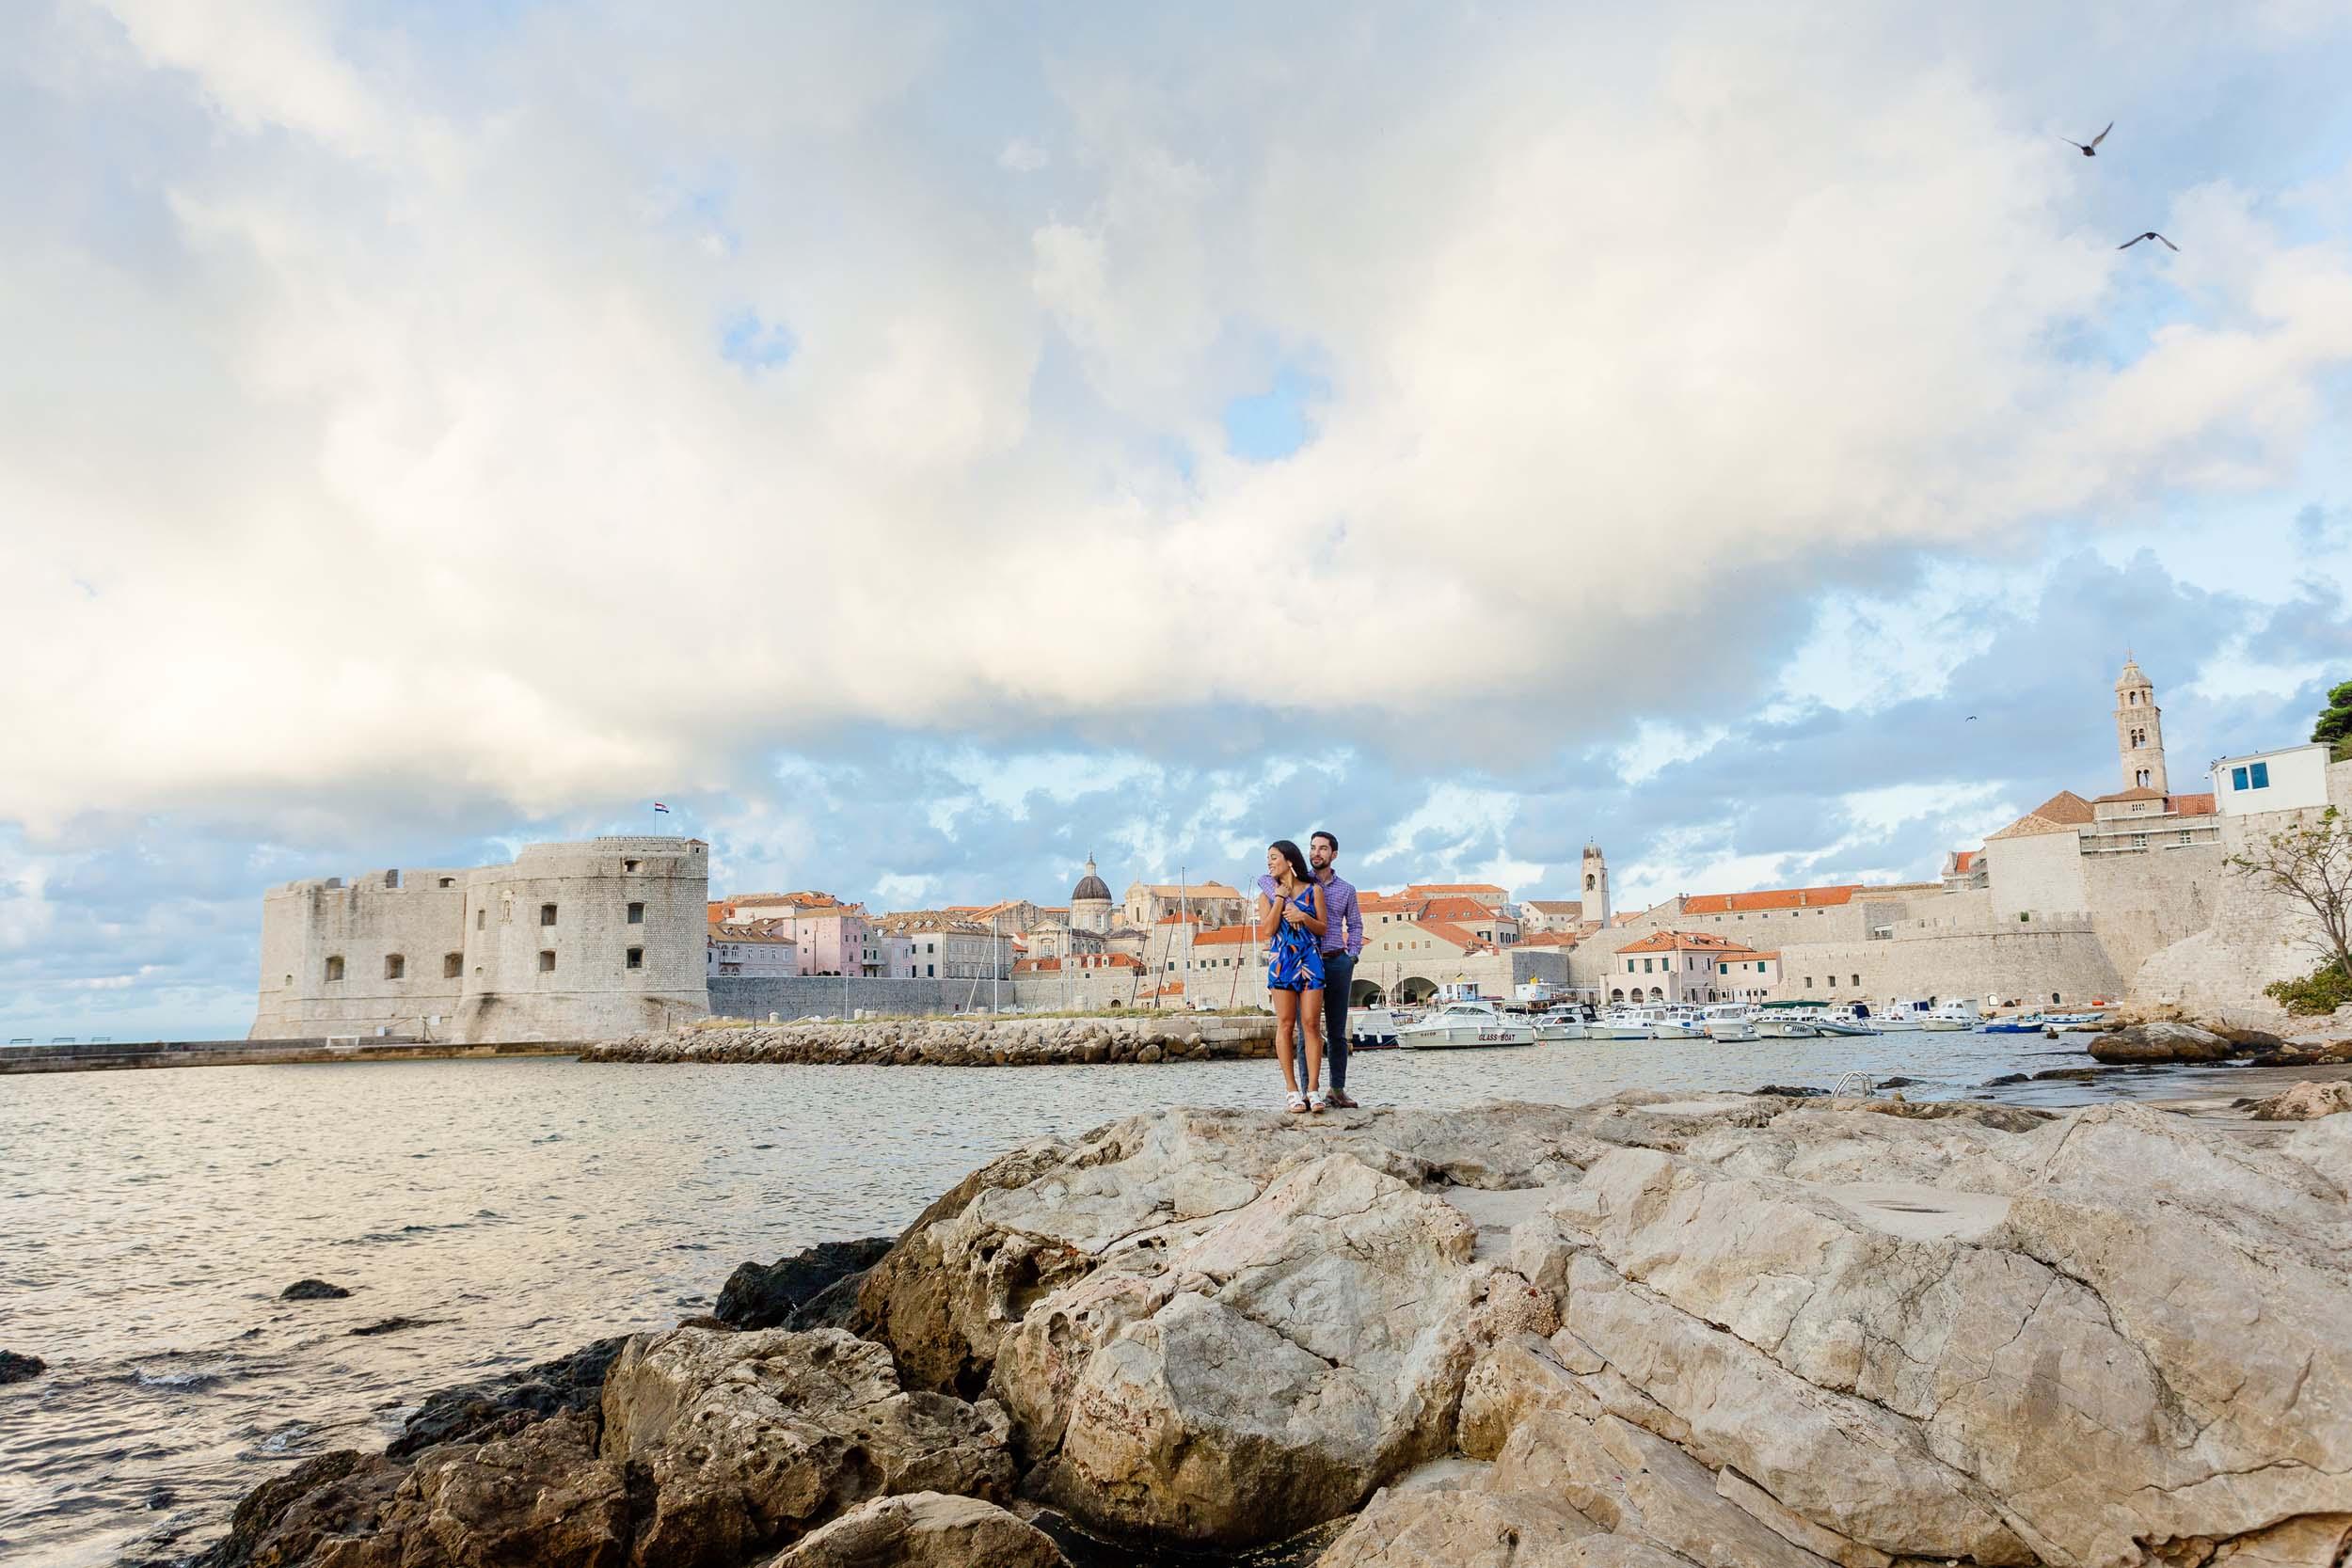 Flytographer Božo in Dubrovnik